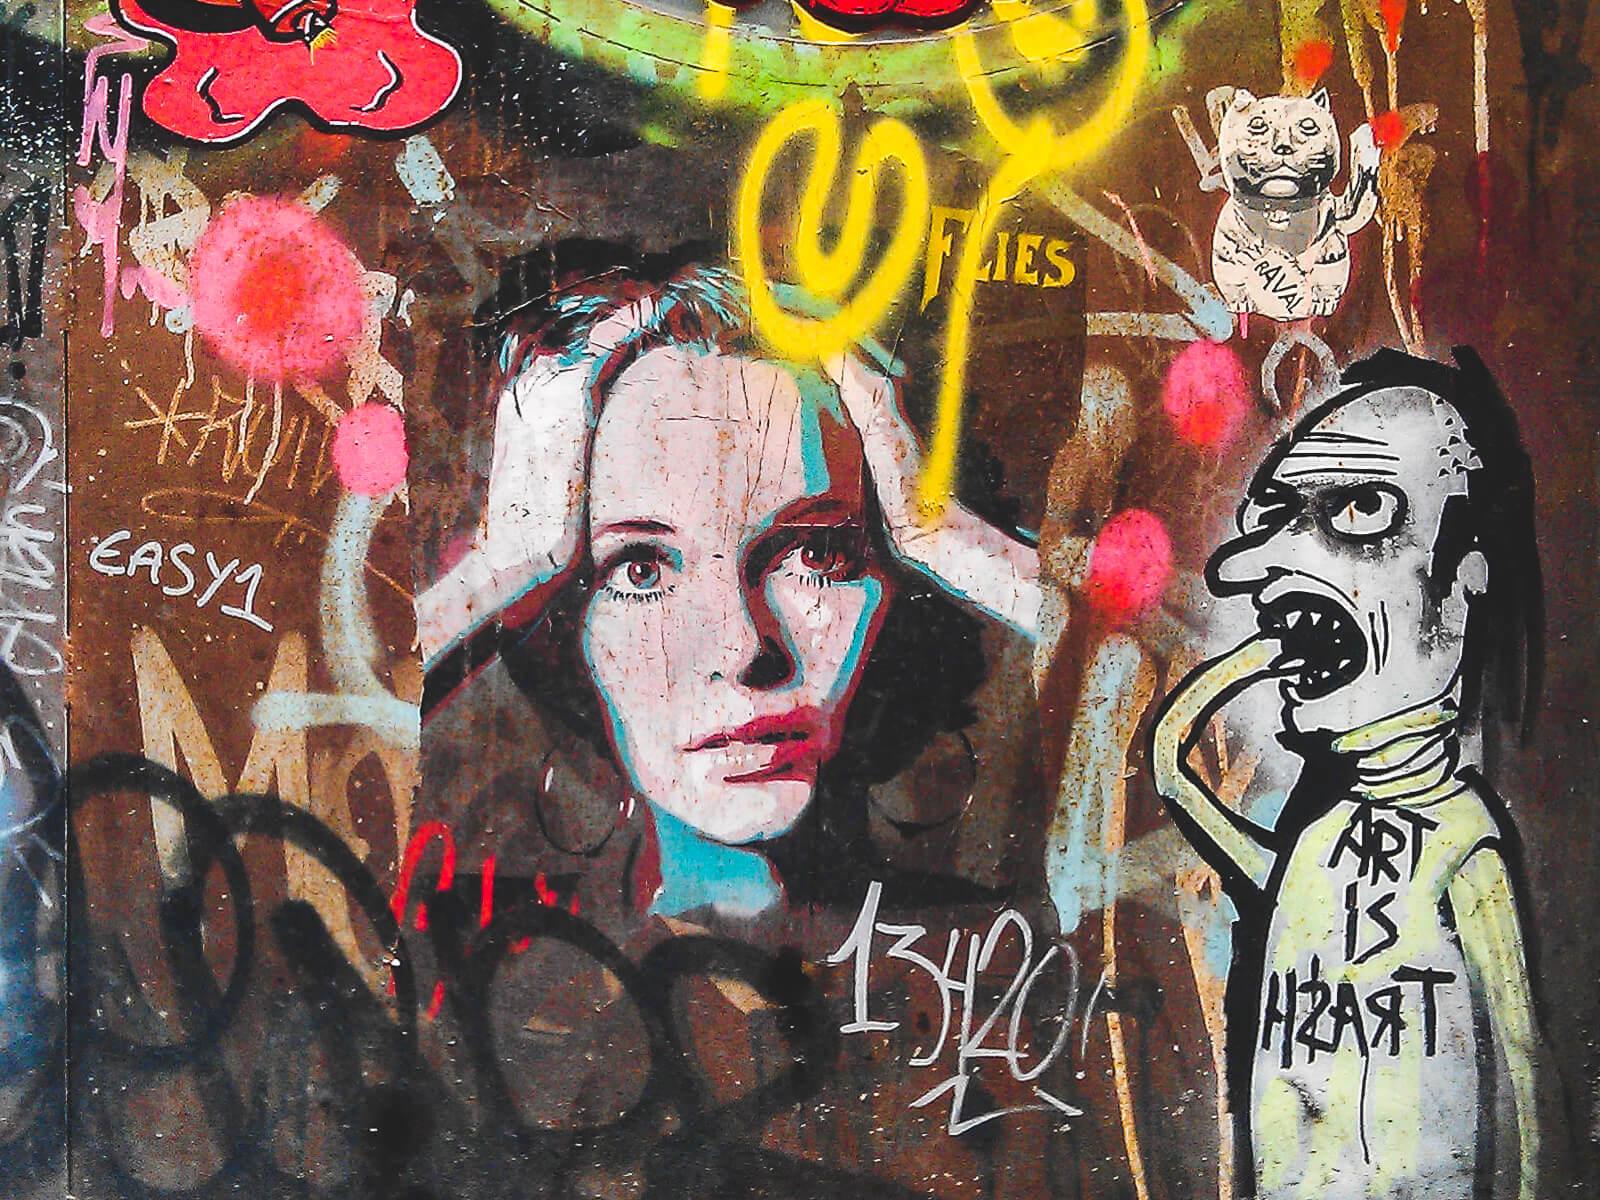 Barcelona Street Photography, art is trash, hands holding head, street art stencil